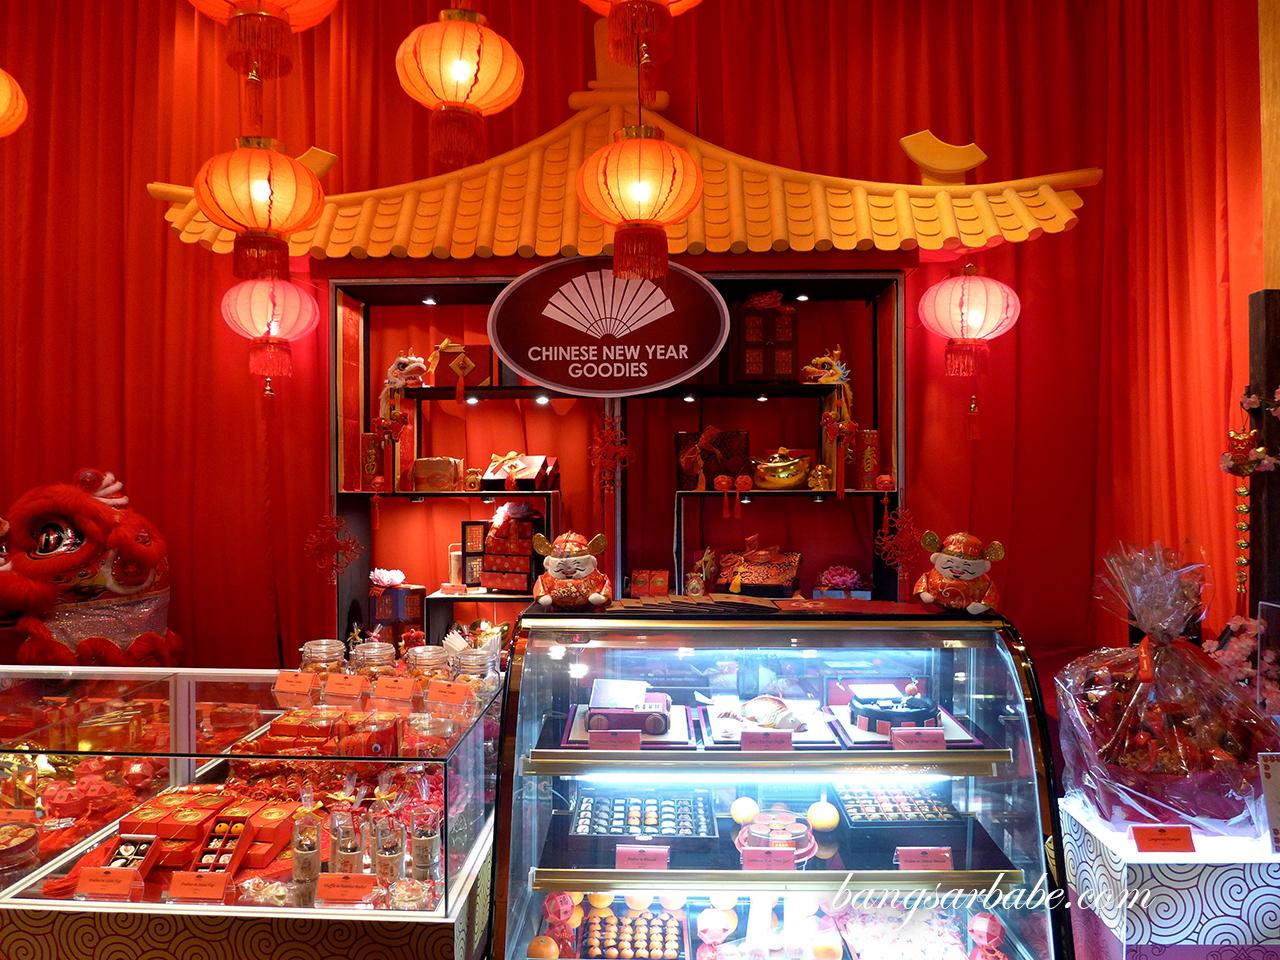 Li Po heen mandarin oriental